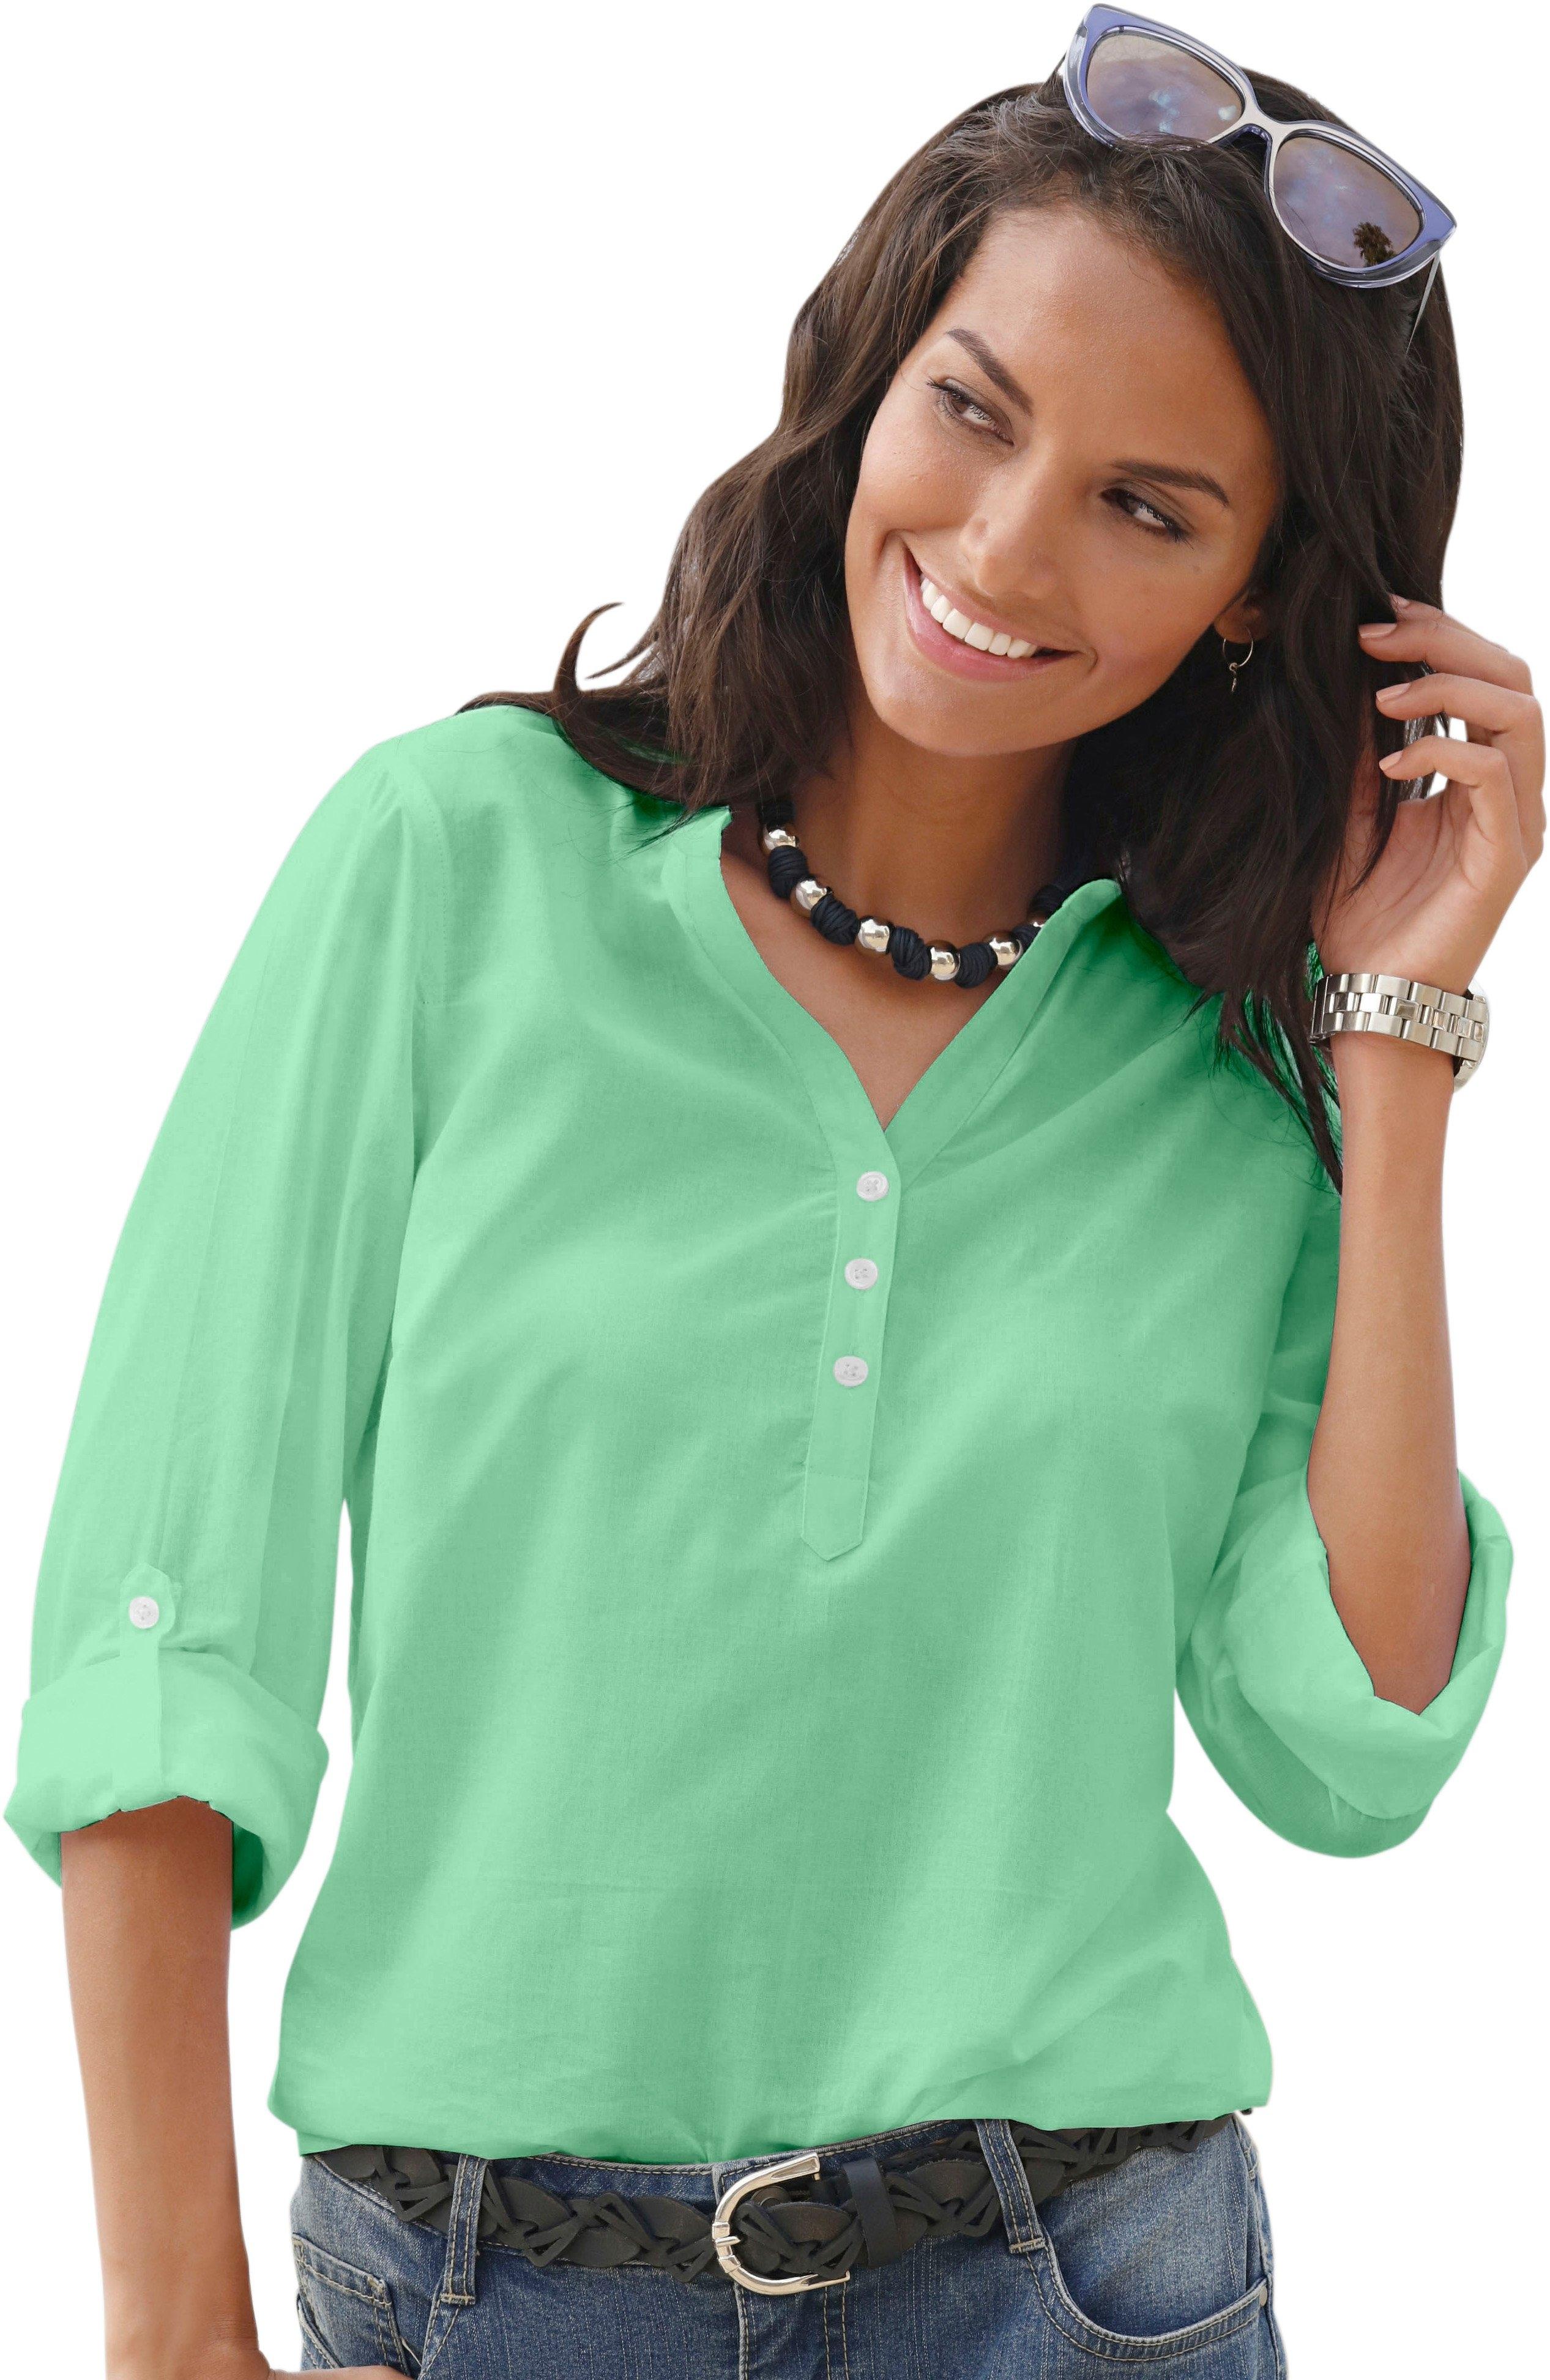 6547708158a ... Blouse met stippen, CHEER blouse in lang model, Tuniek in transparante  georgette-kwaliteit, Classic Inspirationen blouse van puur katoen